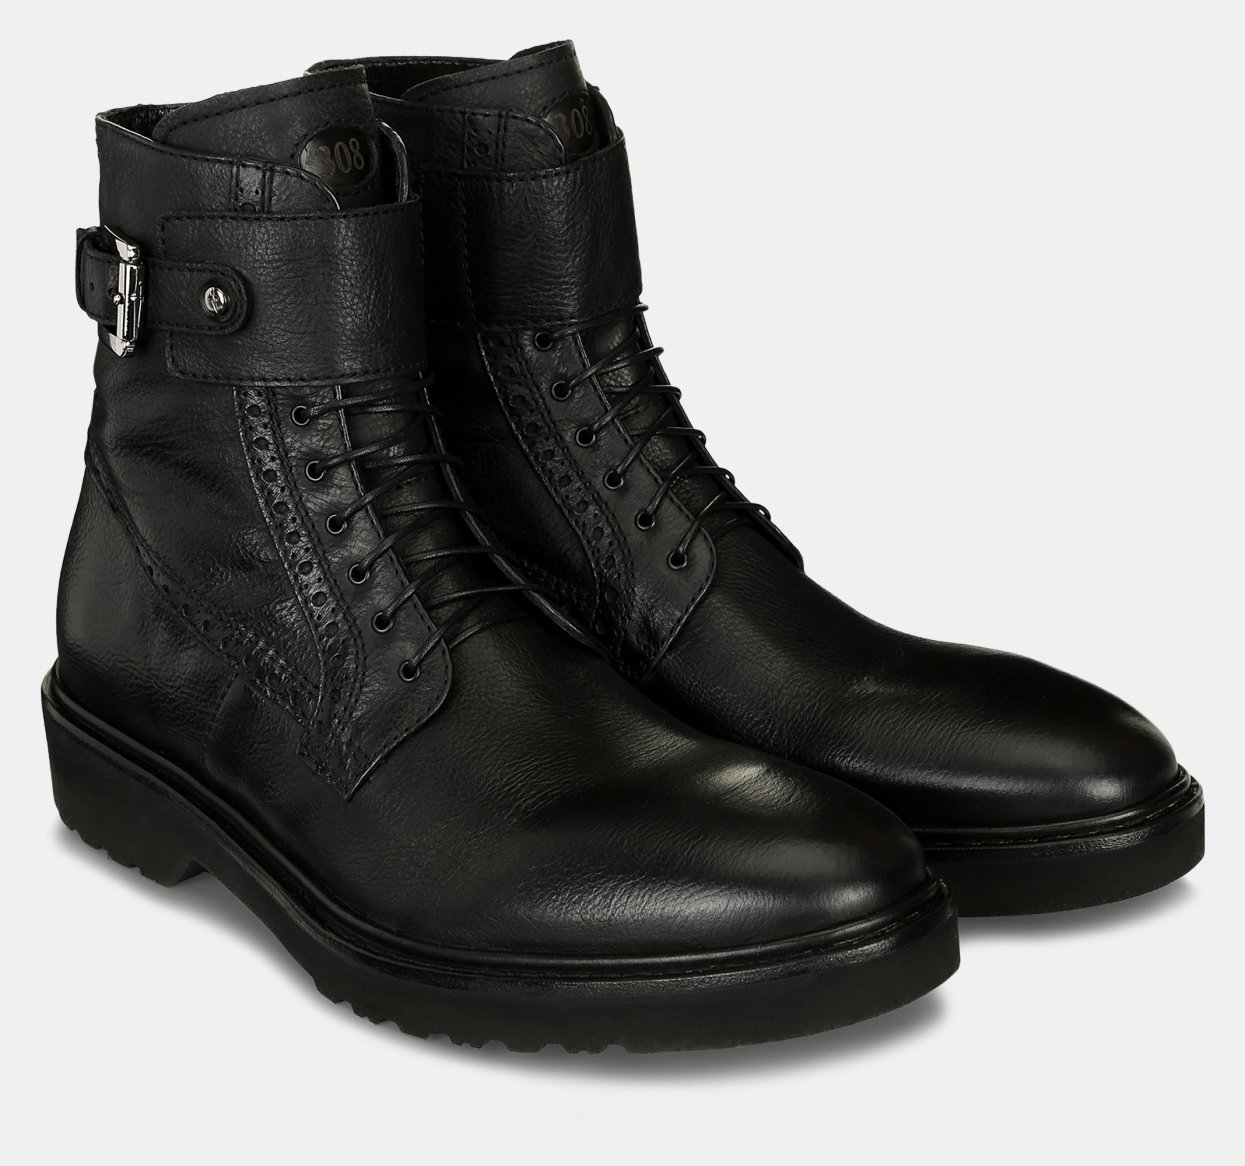 cesare-paciotti-boots-2